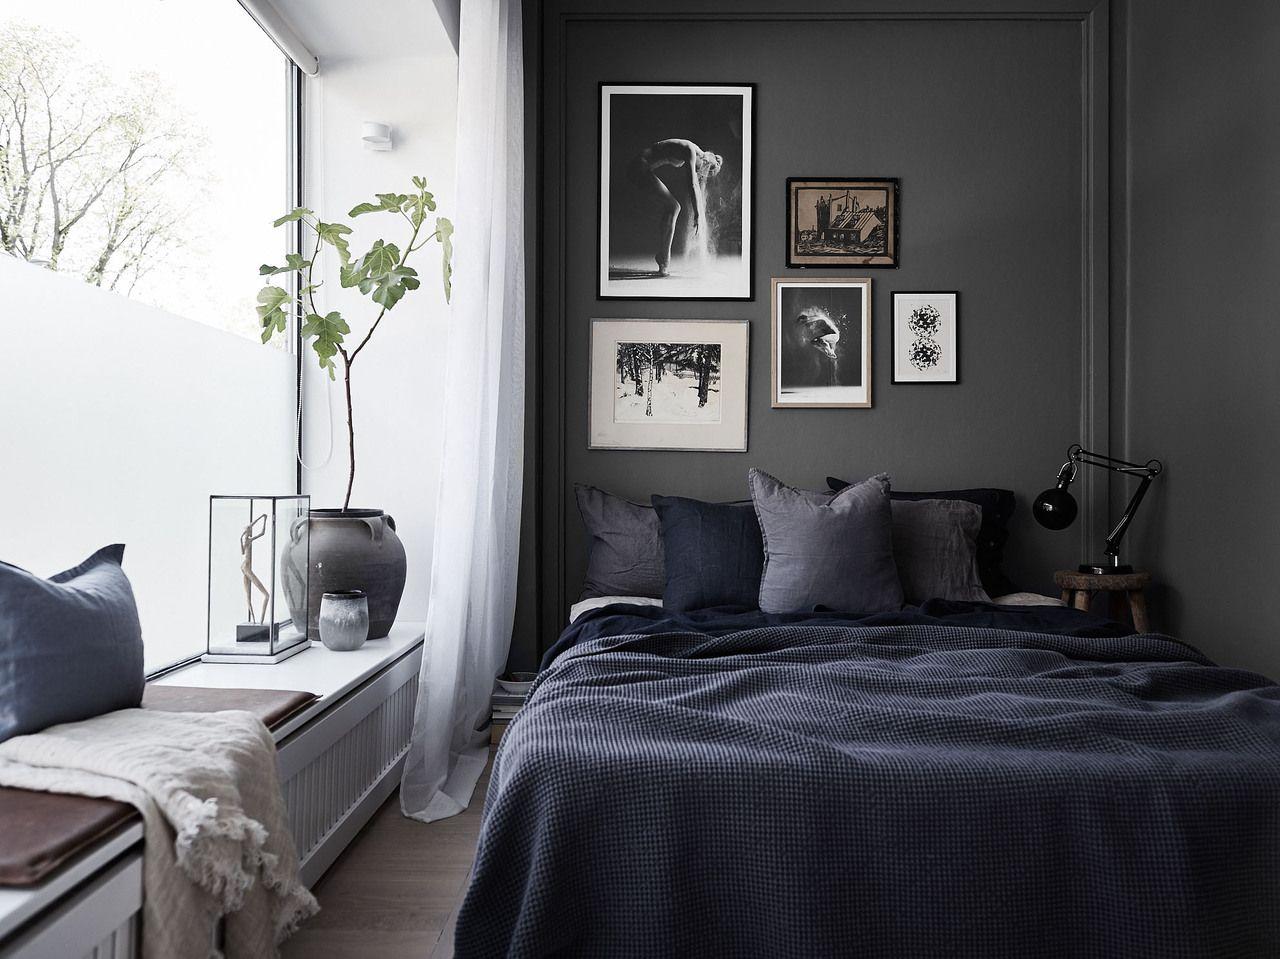 Dark Blue Bedroom Scandinavian Style And Decor Bedroom Ideas Gallery Wall Linen Fig Tree Sculpture Dark Walls Blu Sovrumsideer Vardagsrum Hem Inredning